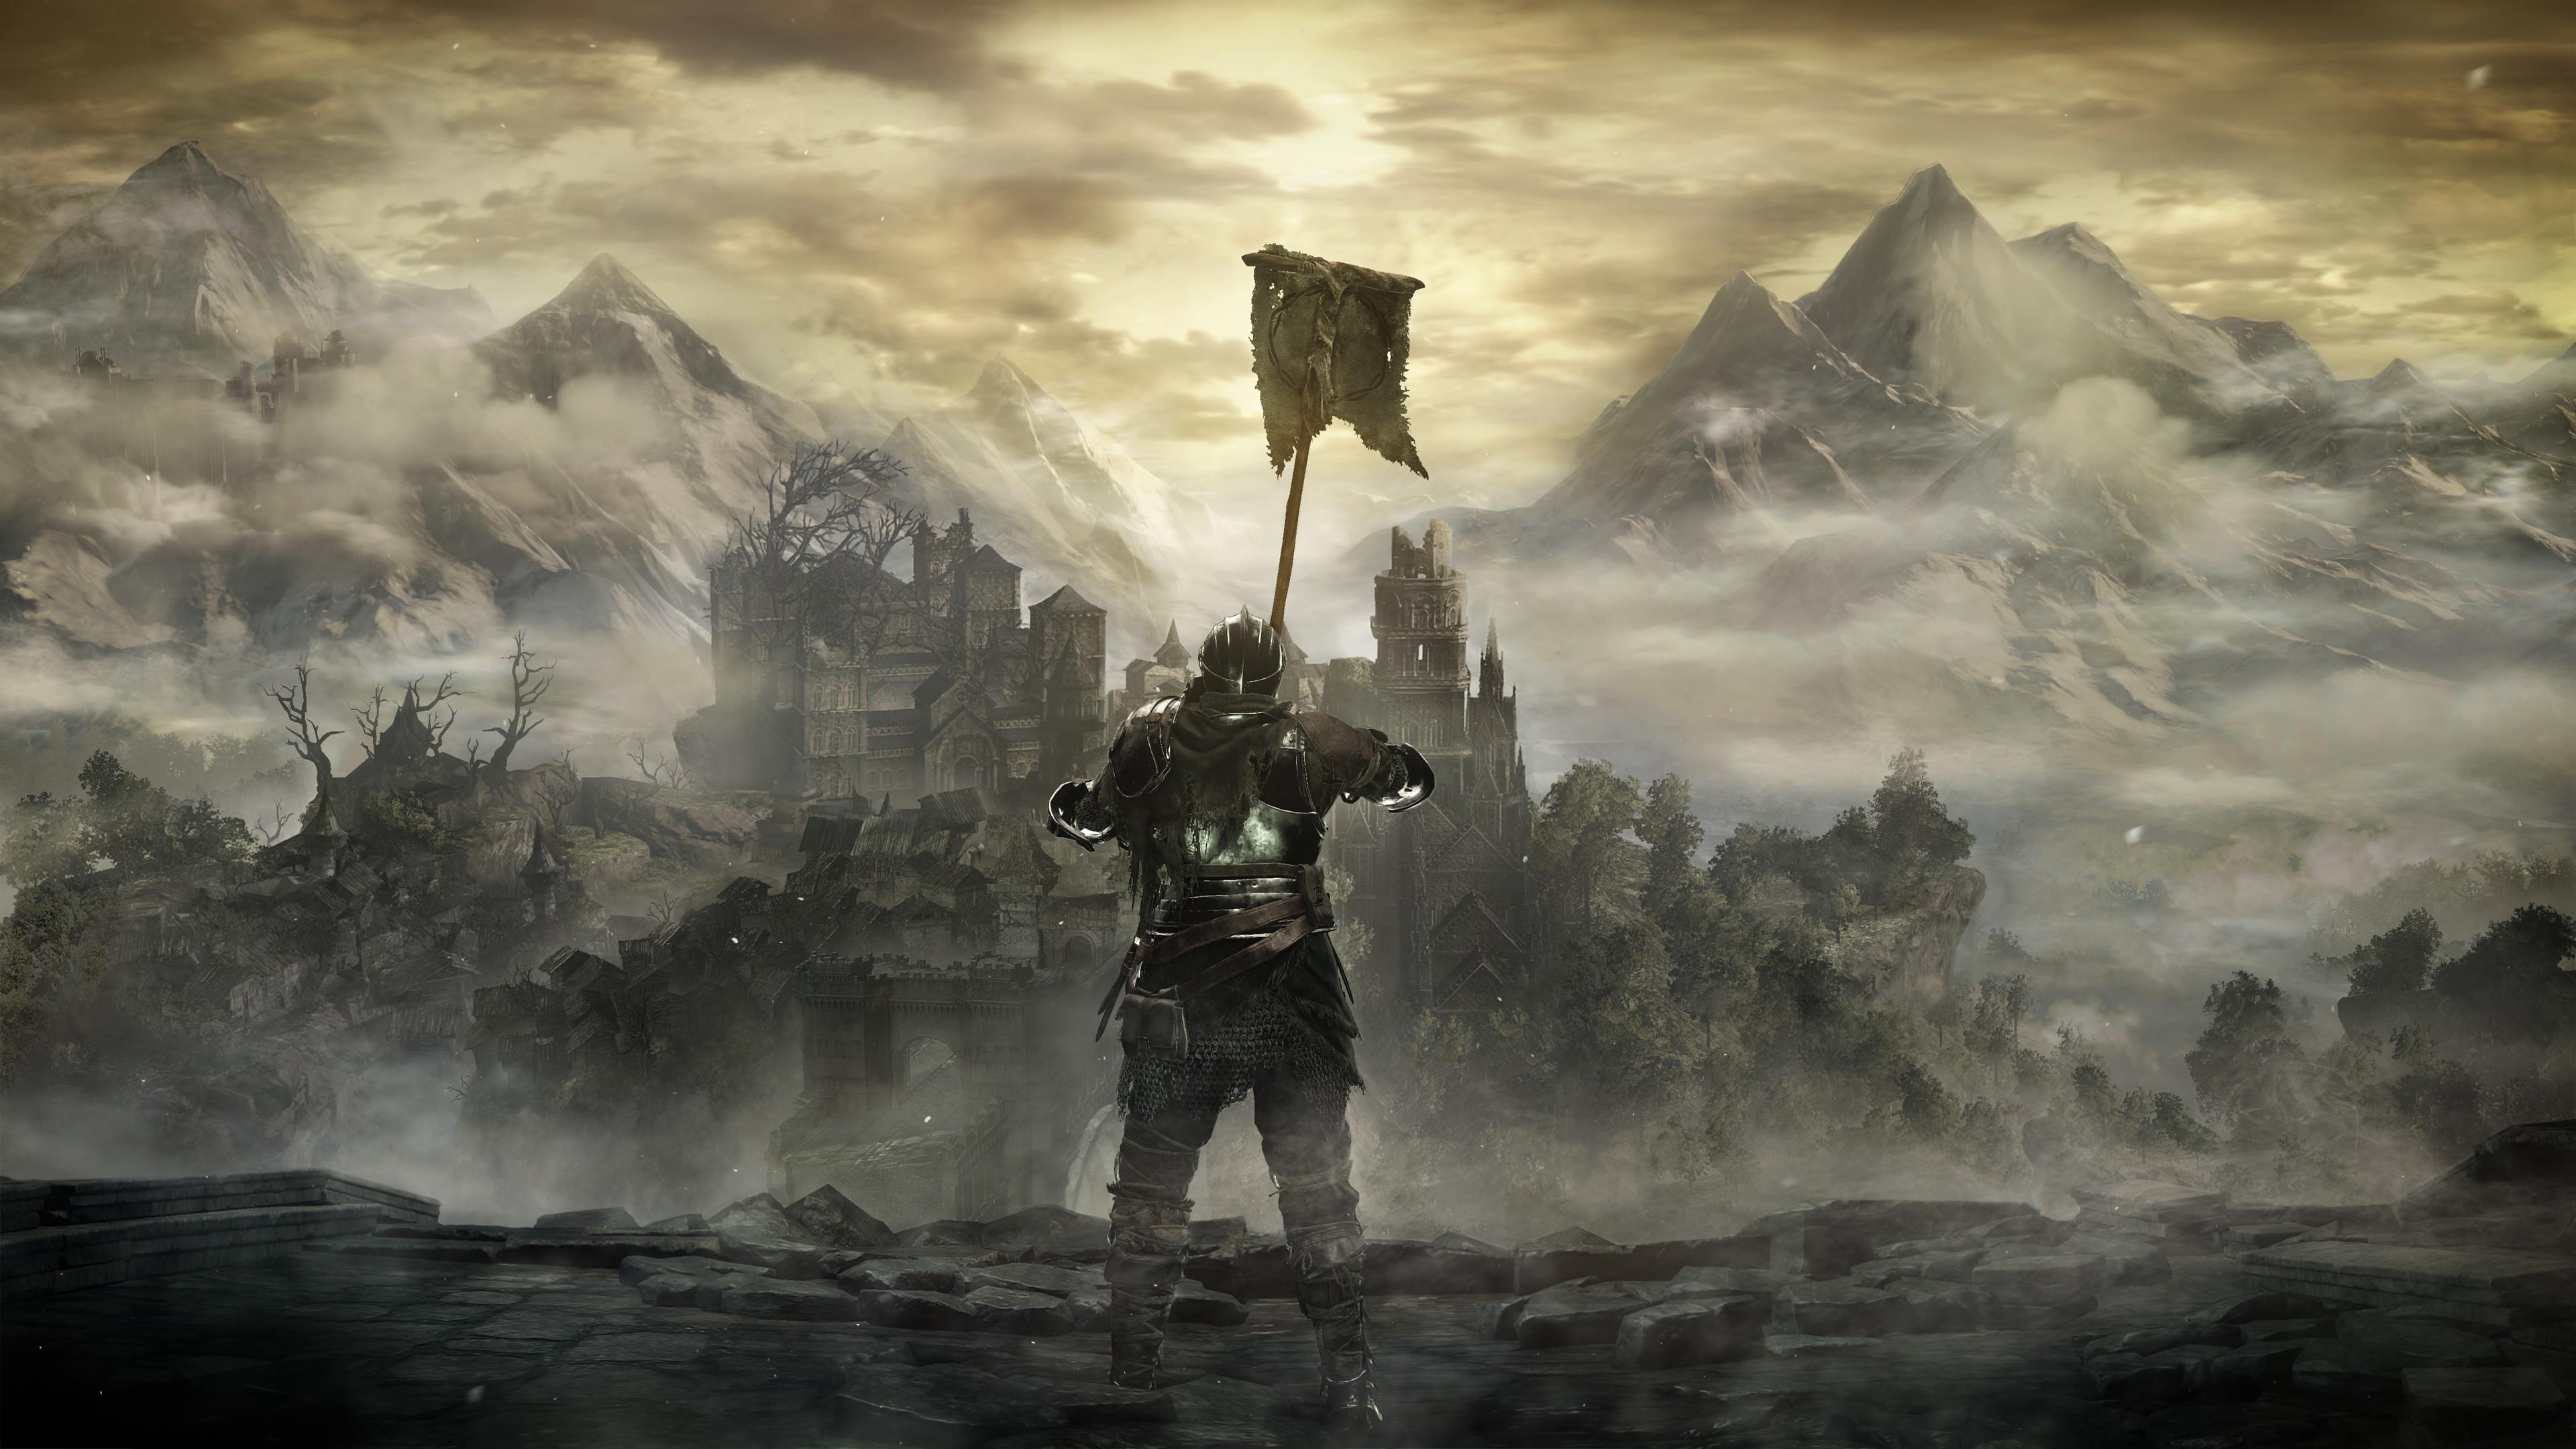 Awesome Dark Souls III Wallpaper